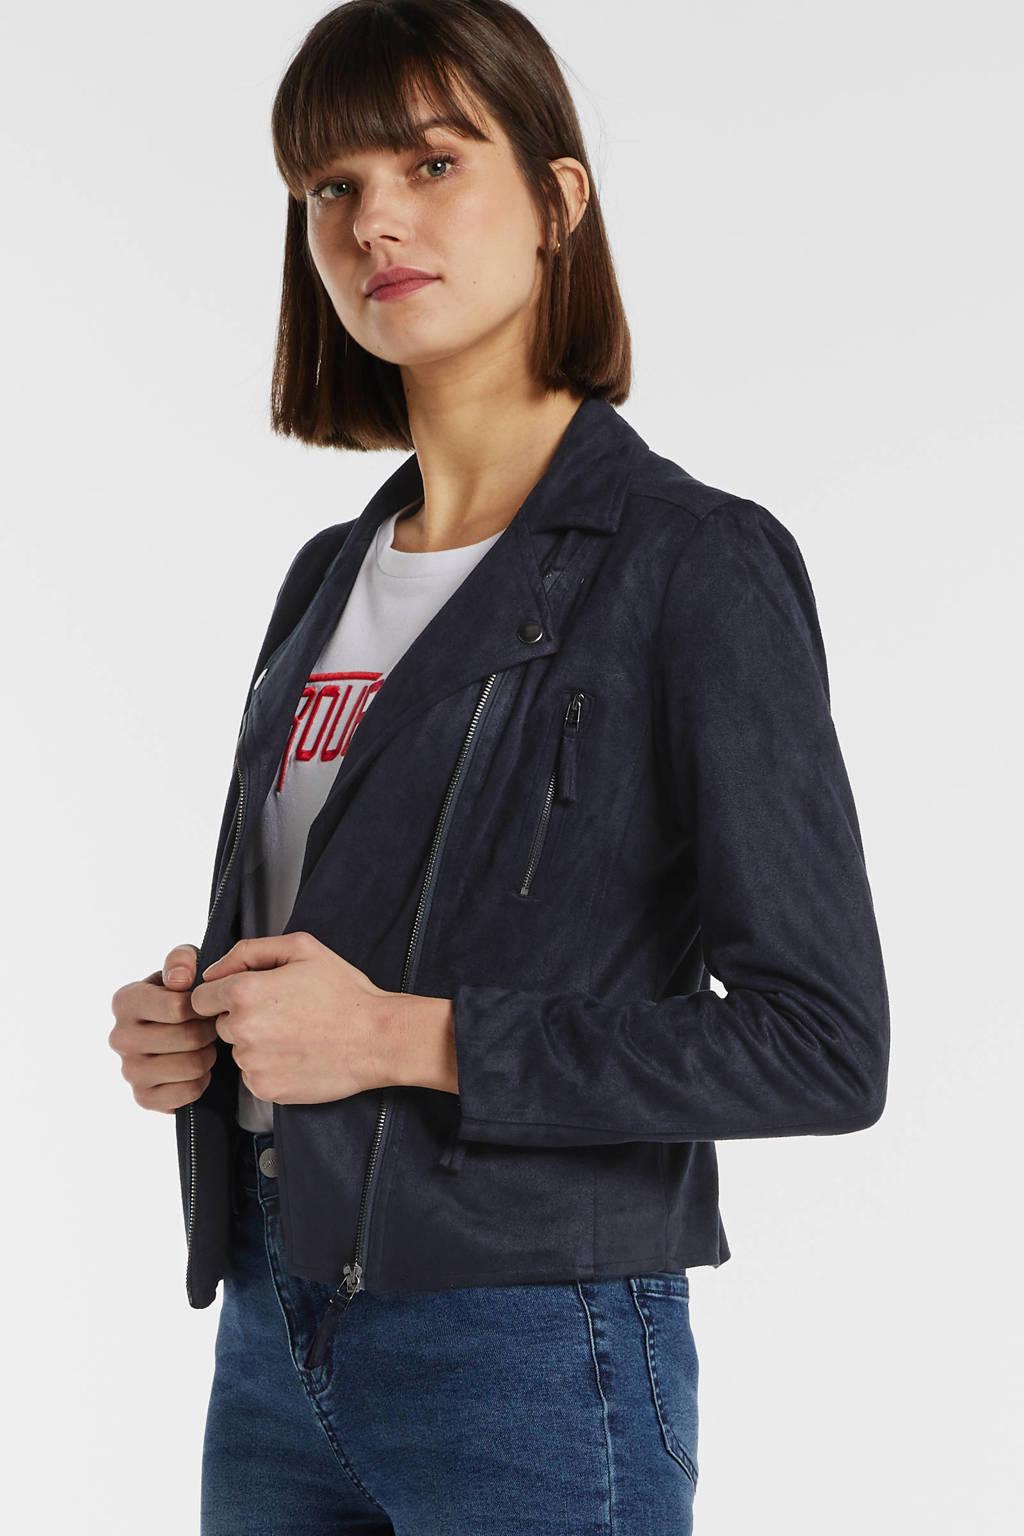 FREEQUENT jasje donkerblauw, Donkerblauw